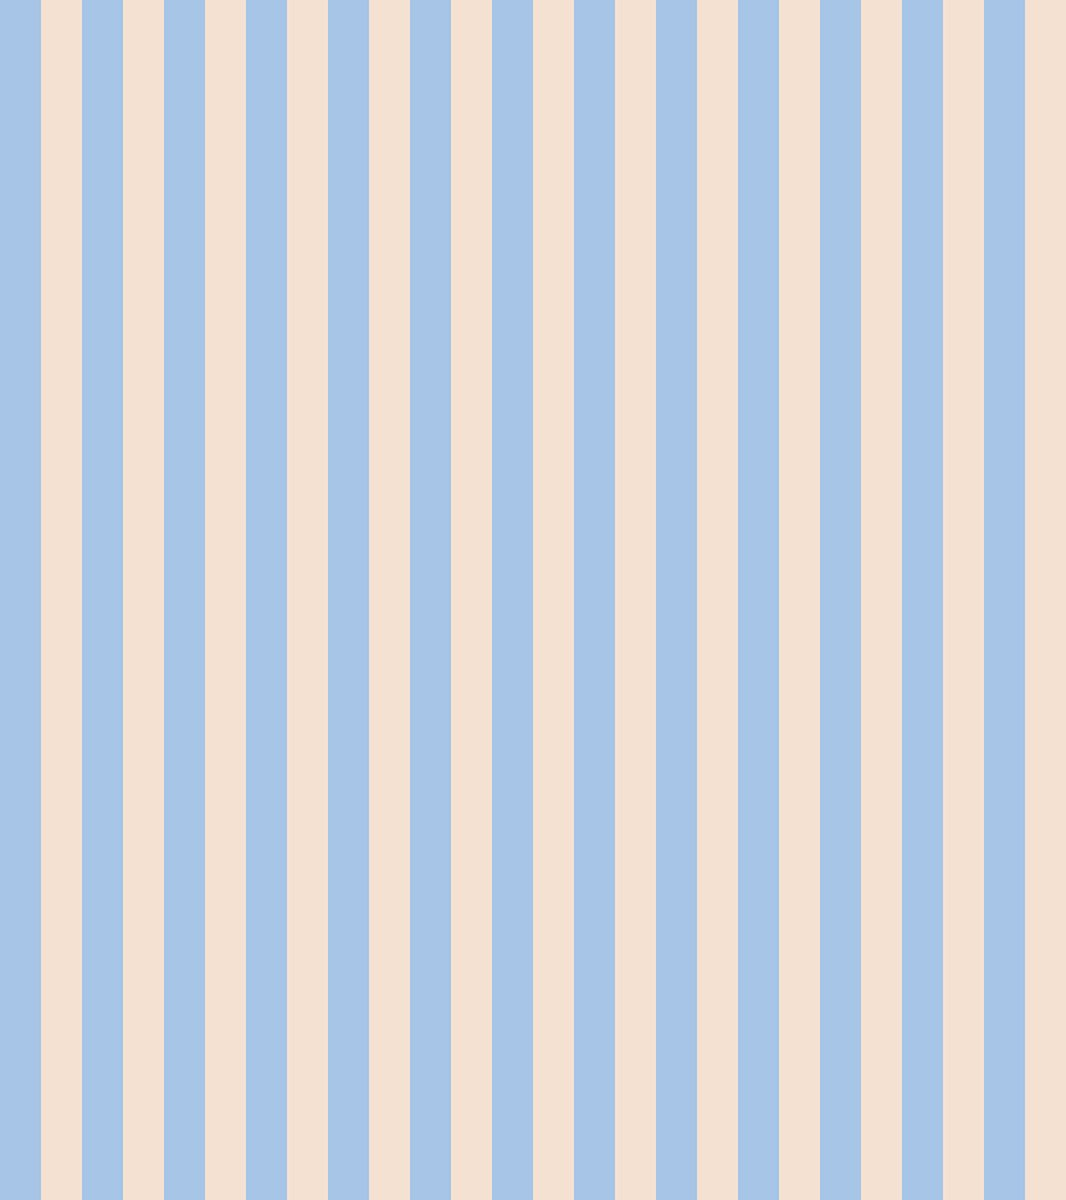 Rifle Paper Co. Primavera Cabana Stripe (Periwinkle)